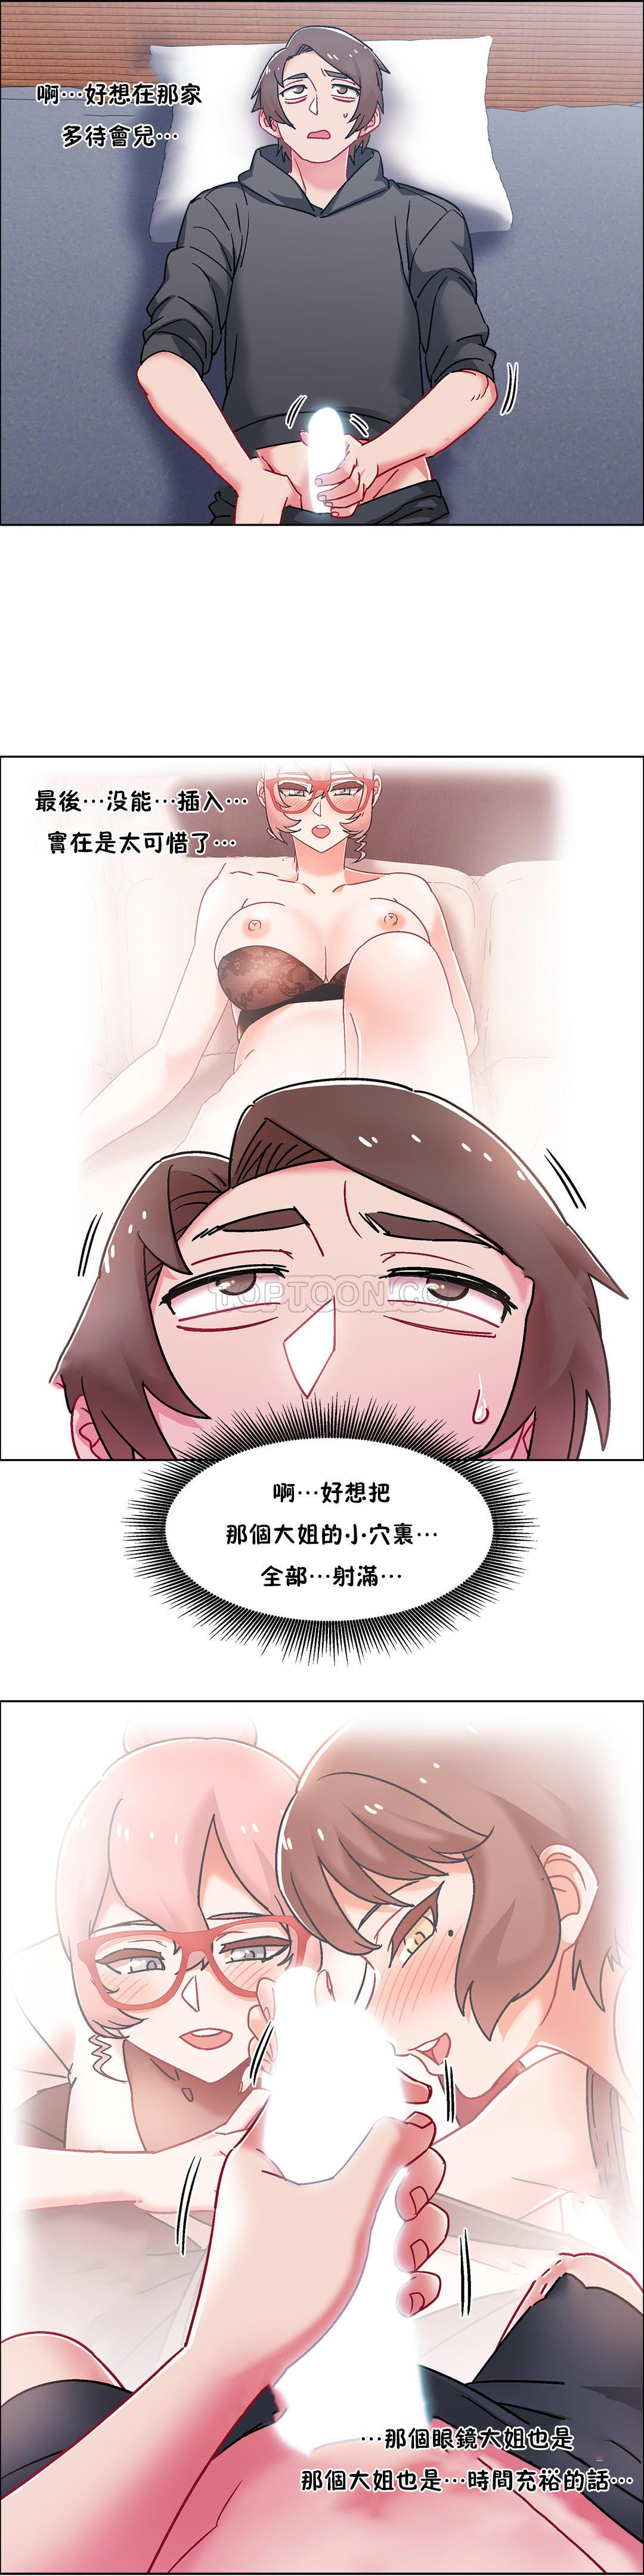 [Studio Wannabe] Rental Girls | 出租女郎 Ch. 33-58 [Chinese]  第二季 完结 403